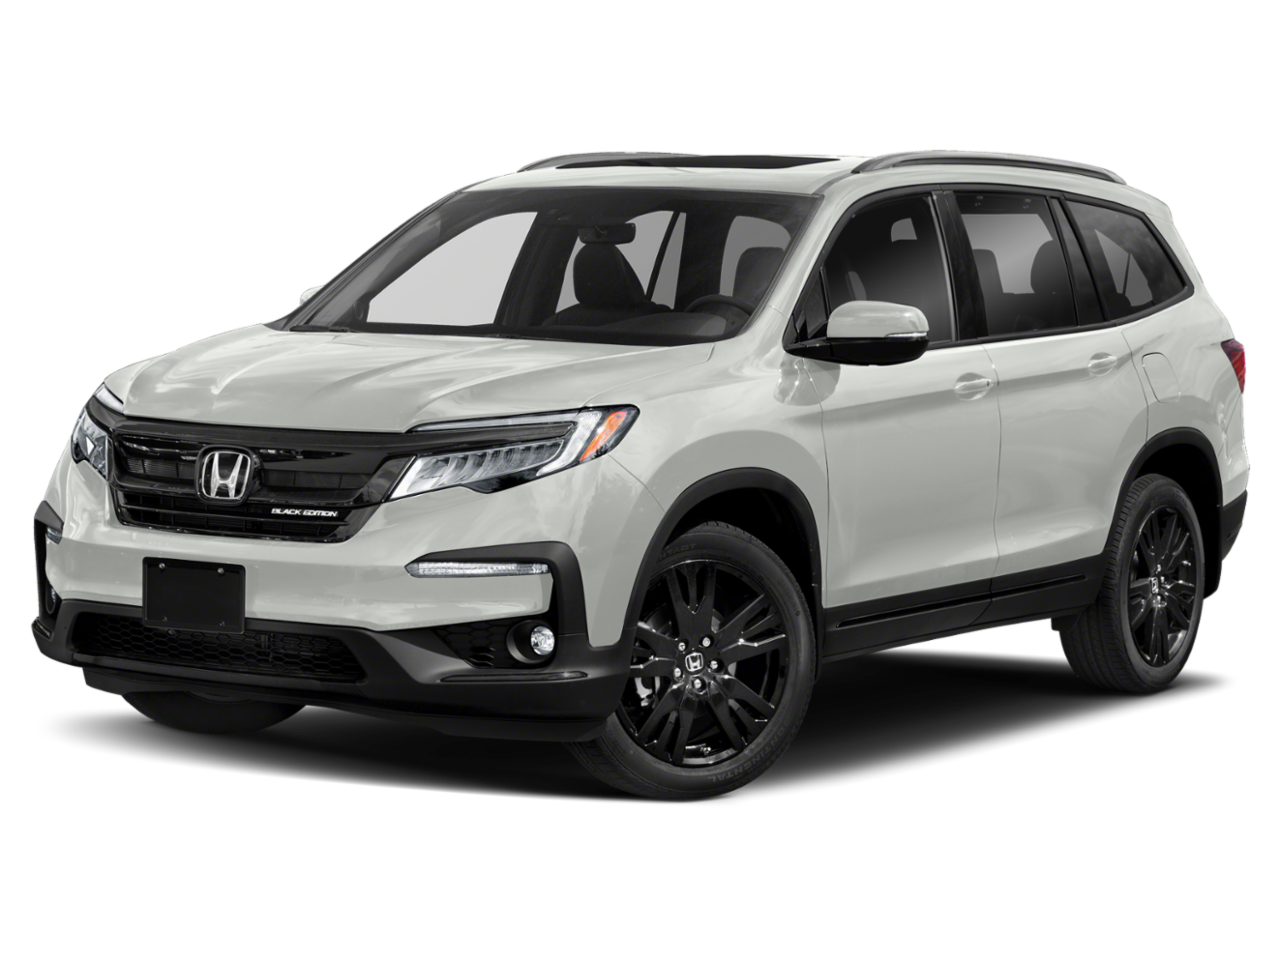 Honda 2021 Pilot Black Edition